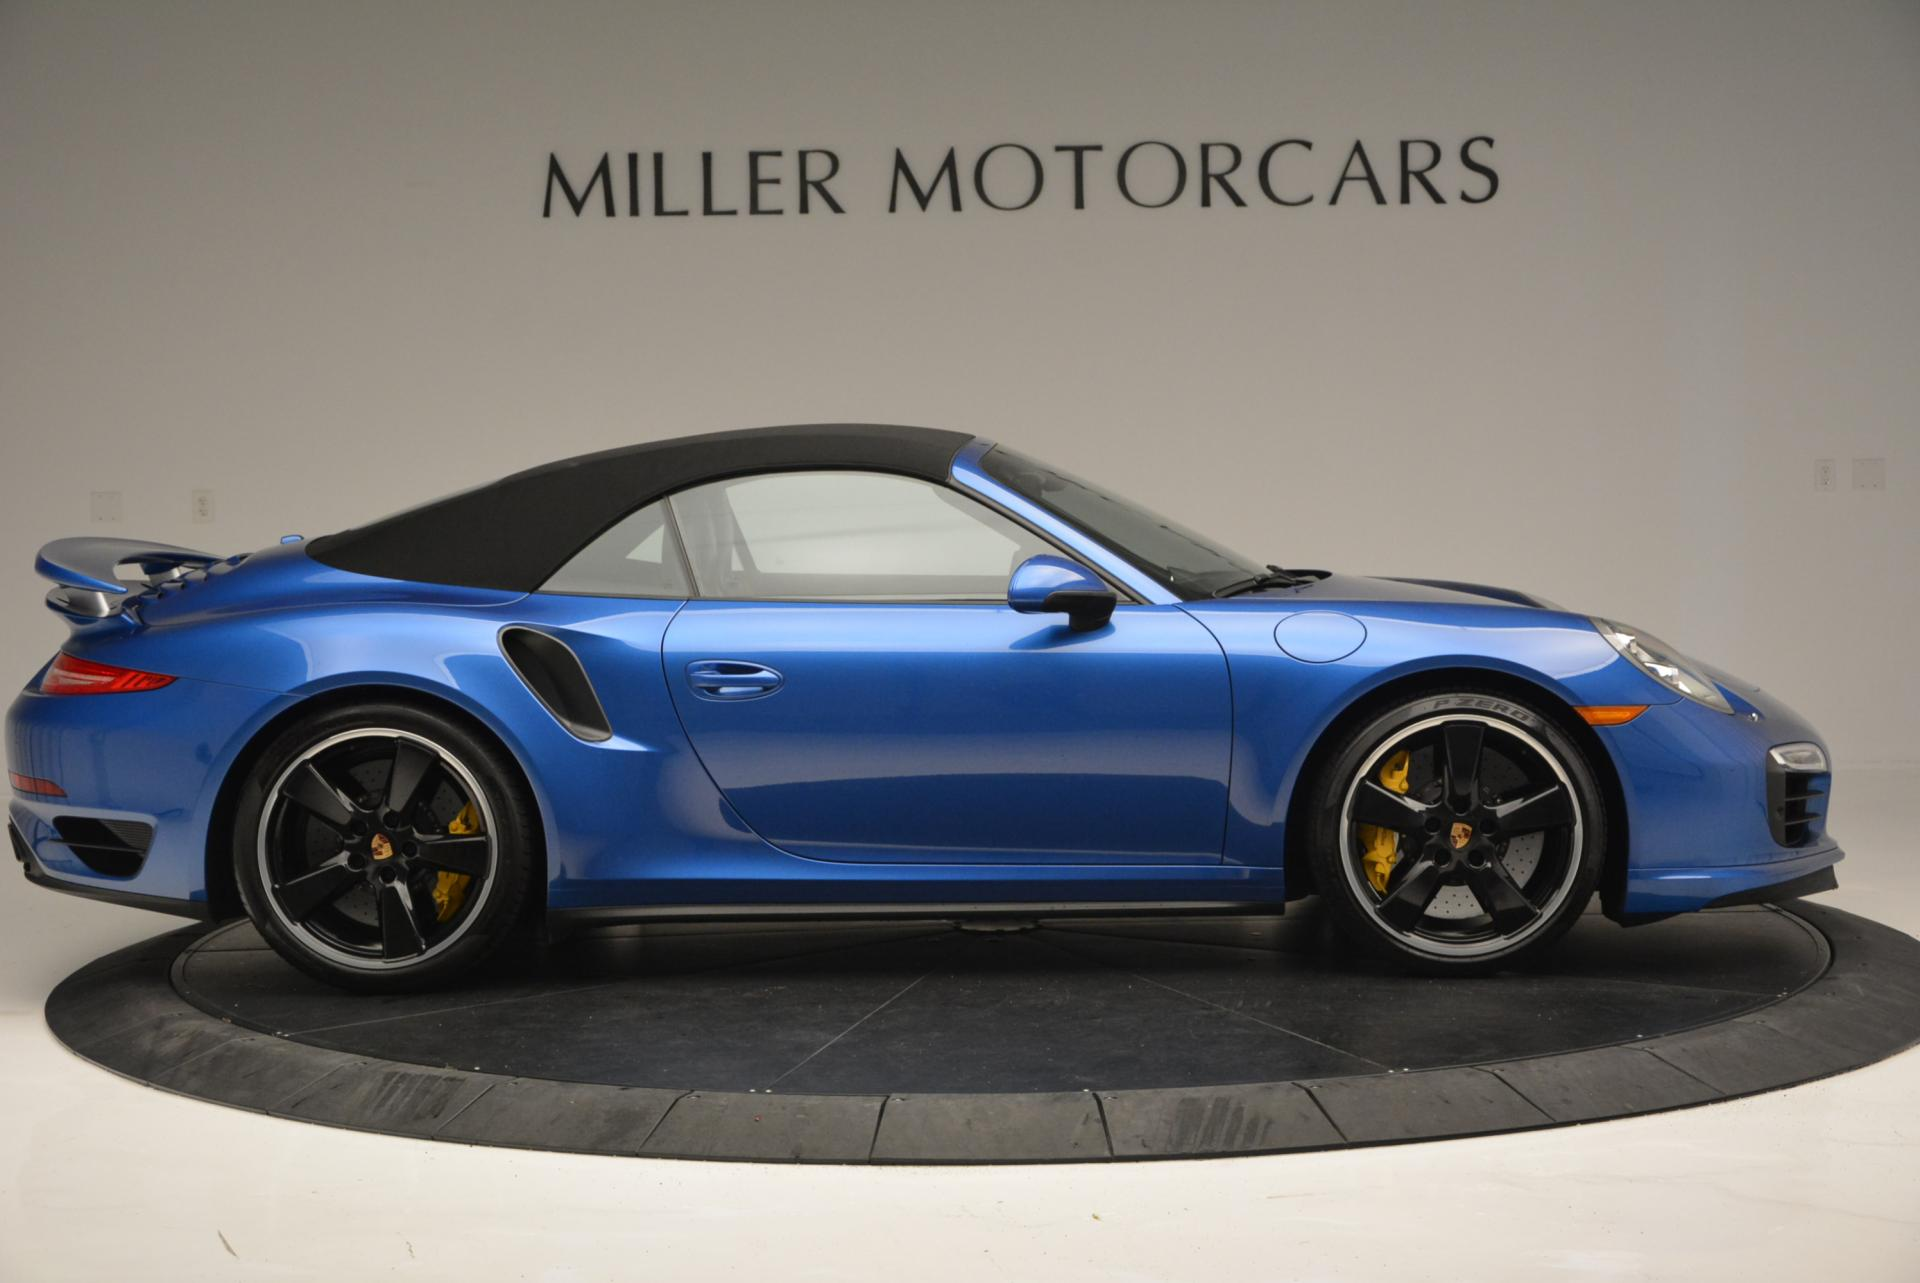 Used 2014 Porsche 911 Turbo S For Sale In Greenwich, CT 105_p15